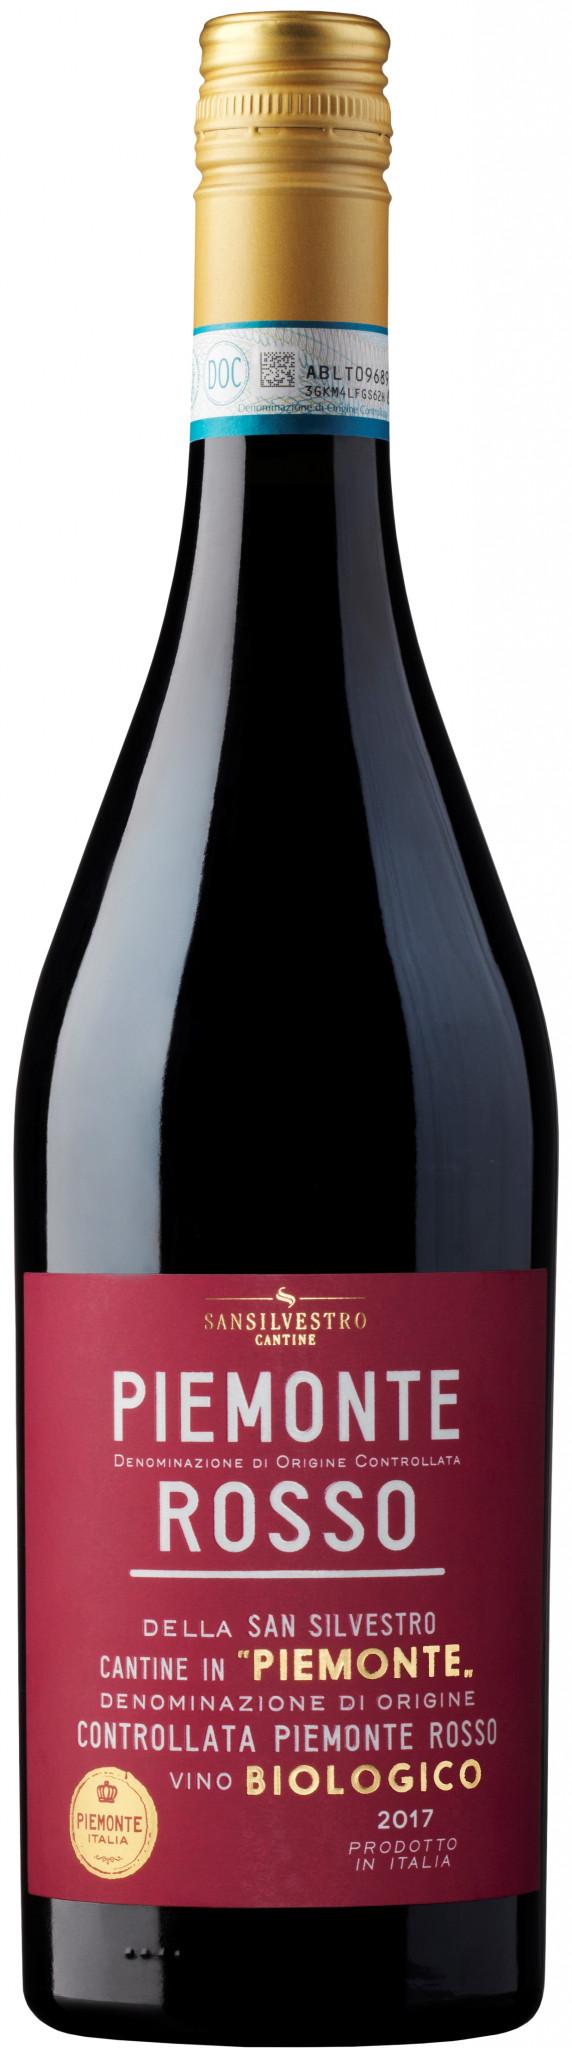 Piemonte Rosso